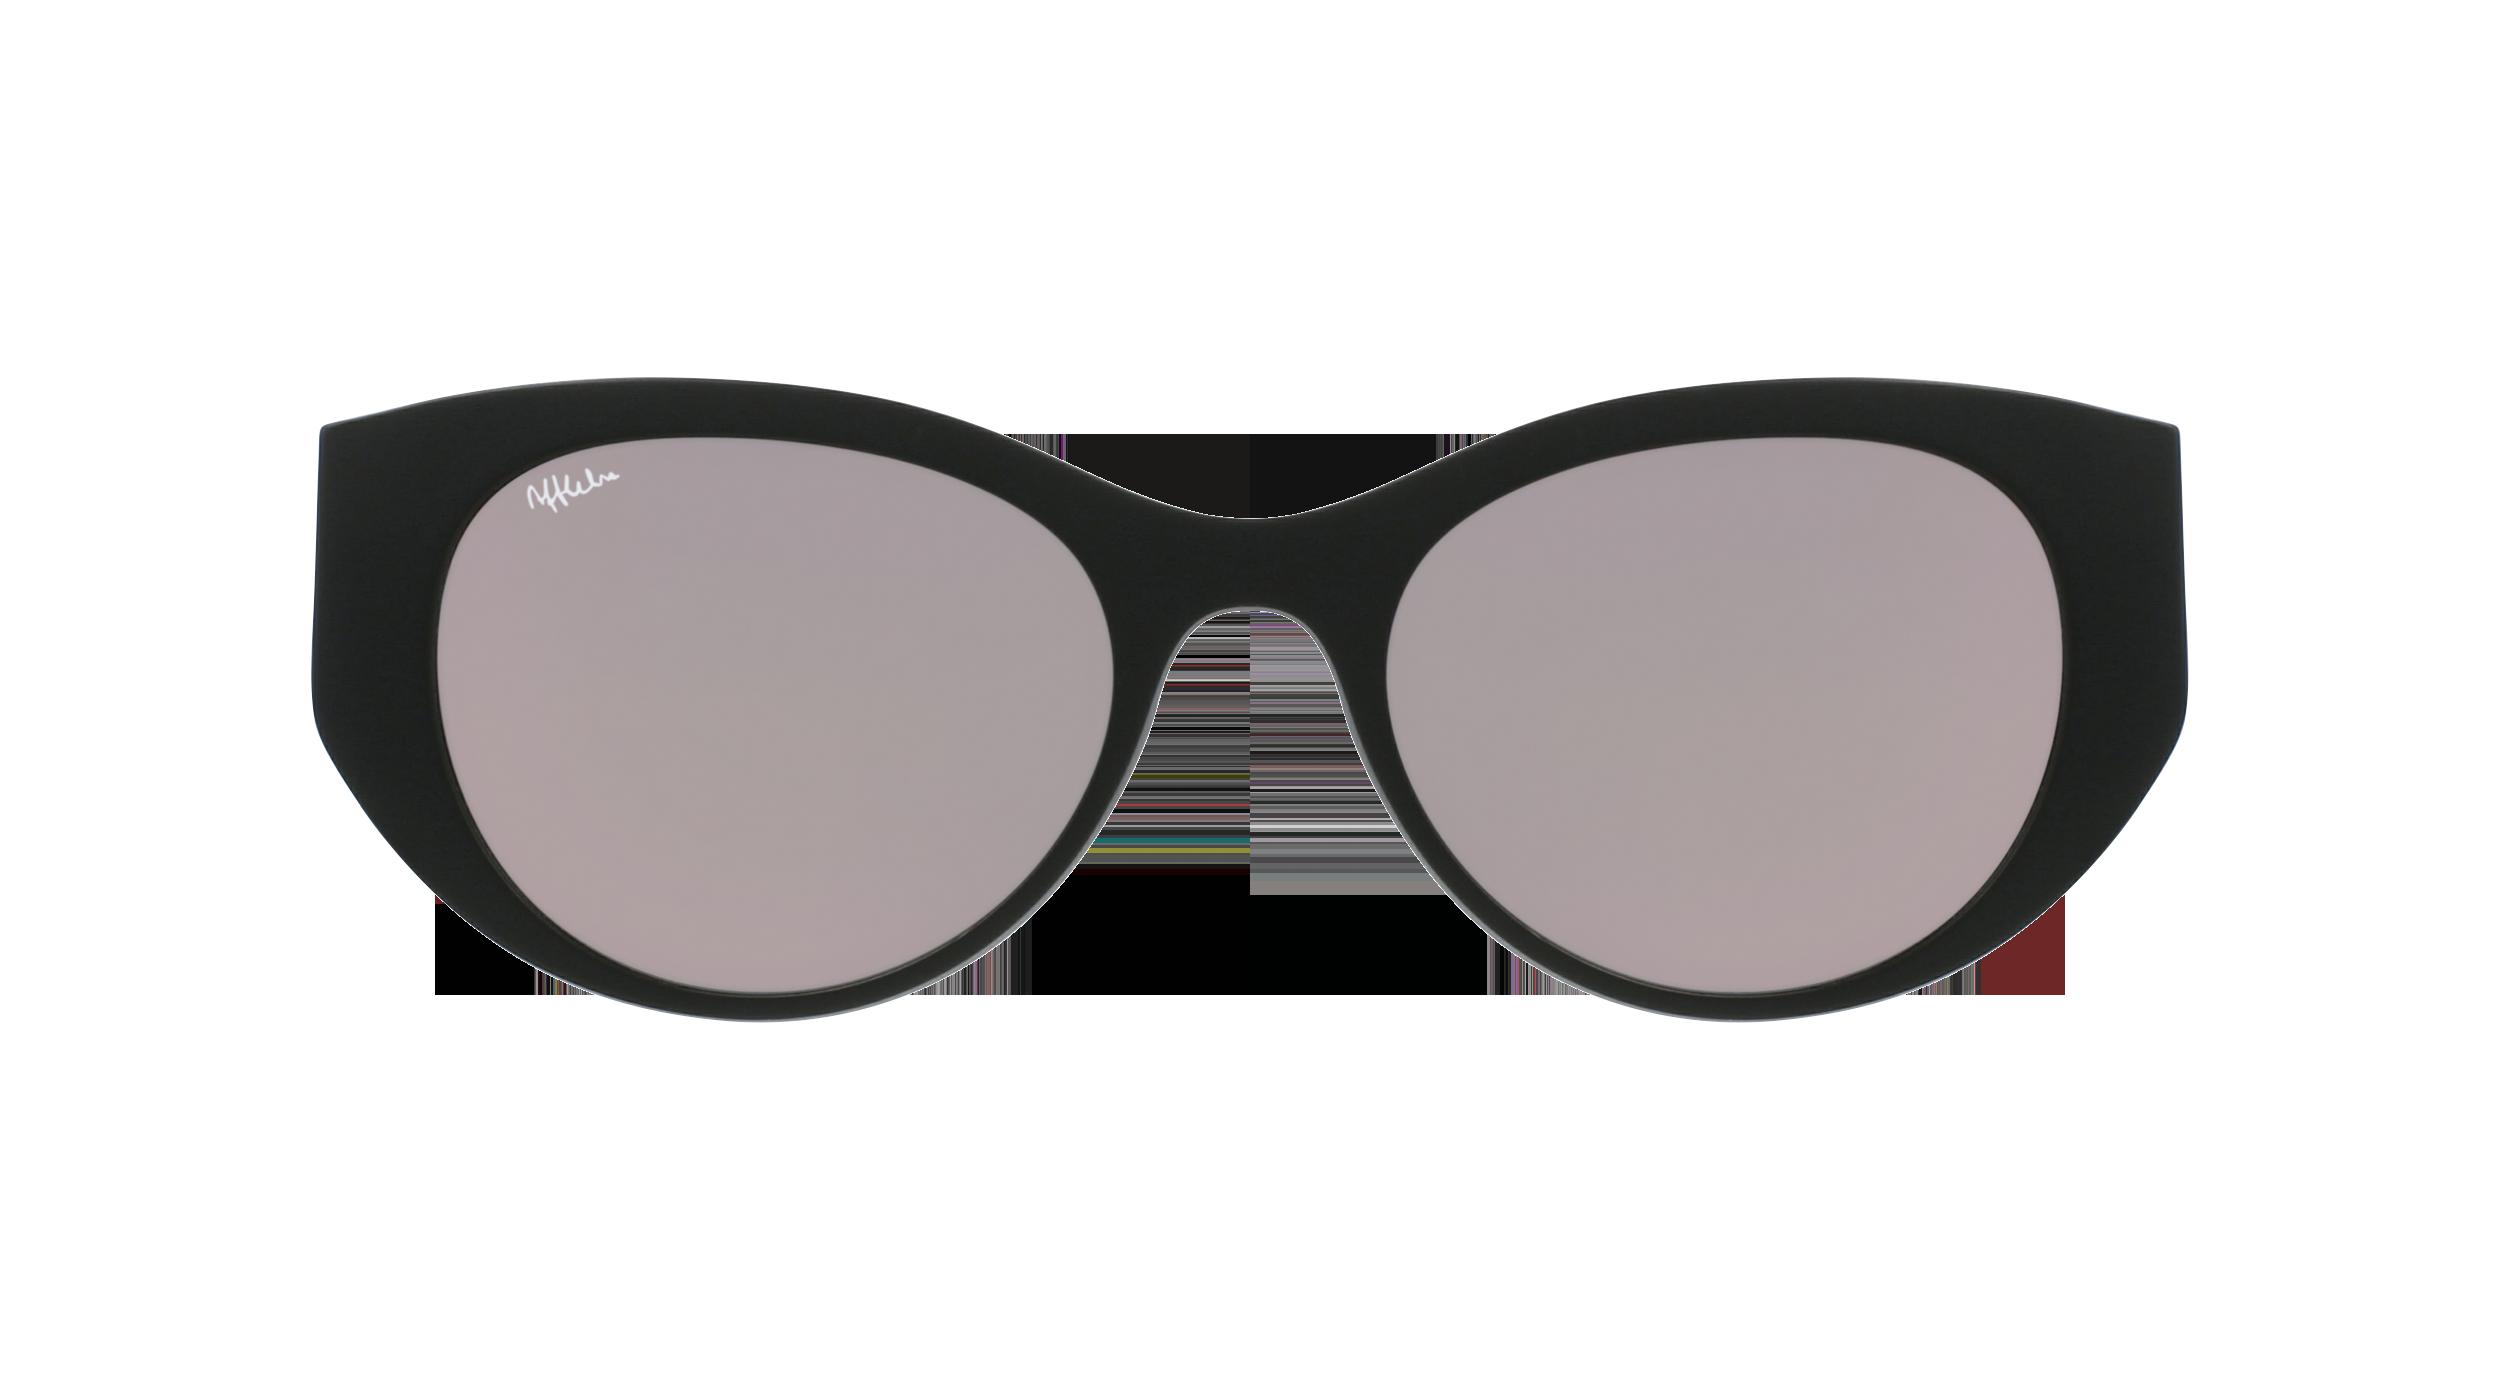 afflelou/france/products/smart_clip/clips_glasses/07630036458983.png